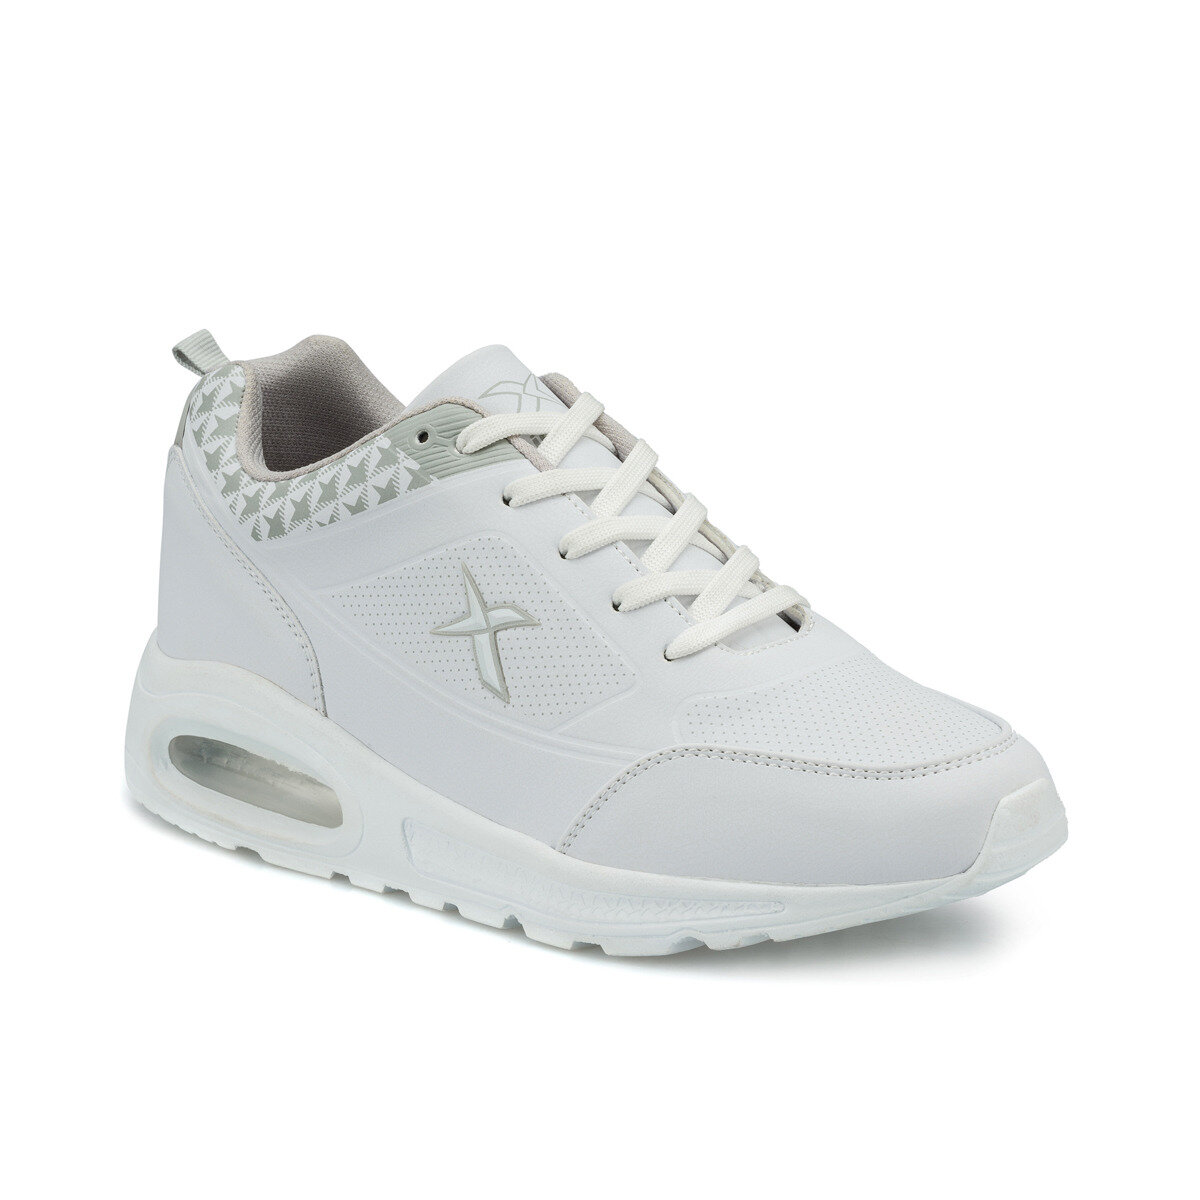 FLO T M White Men 'S Sneaker Shoes KINETIX